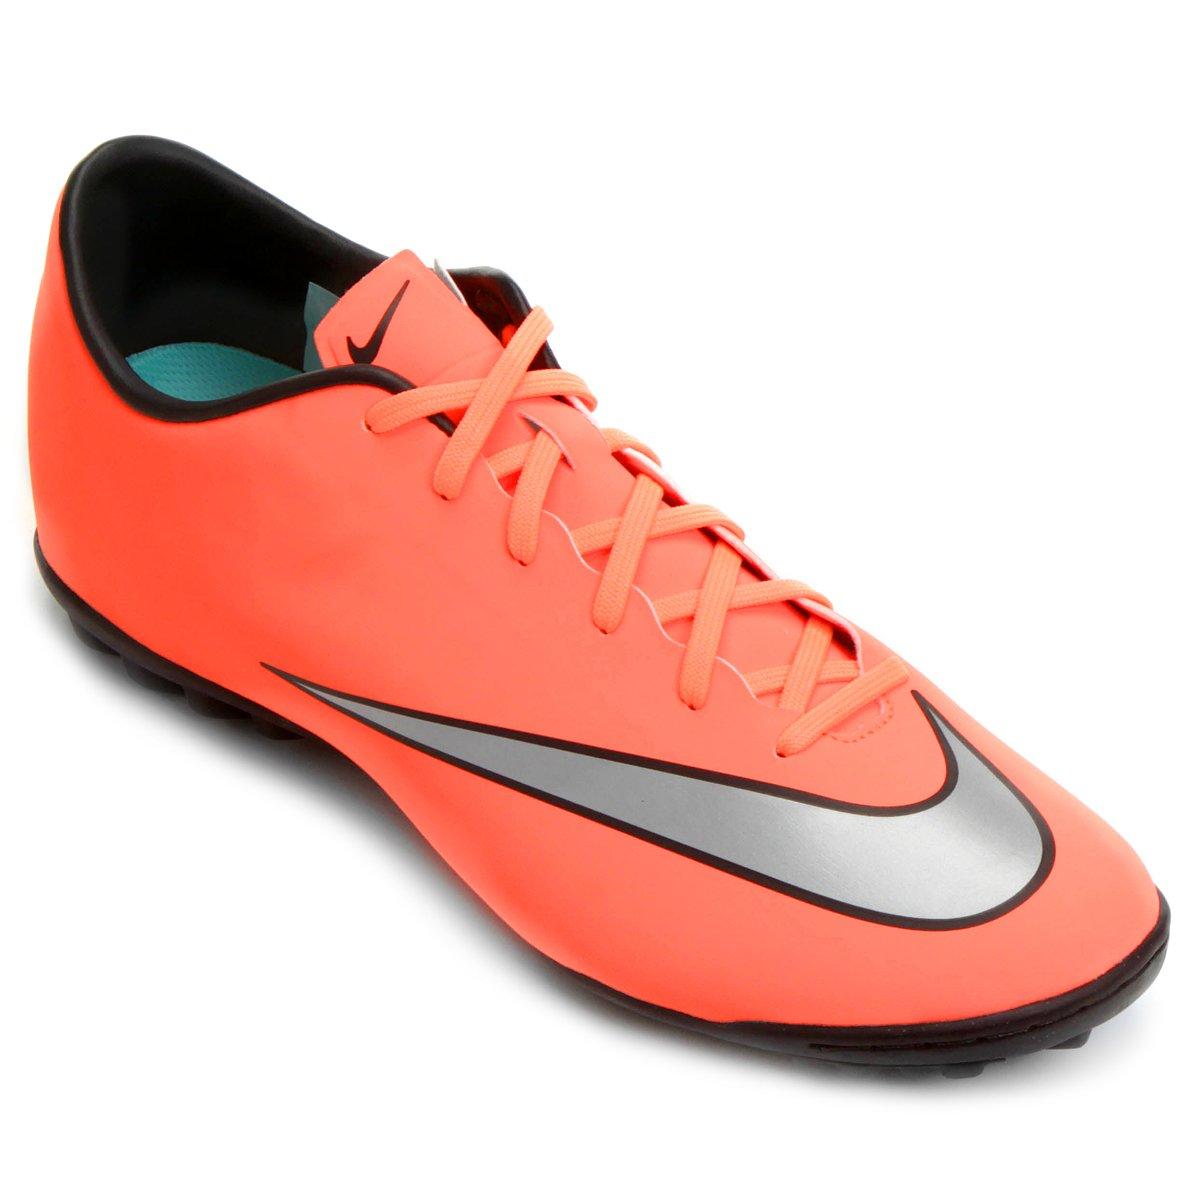 eeb771e54d Chuteira Society Nike Mercurial Victory 5 TF - Compre Agora